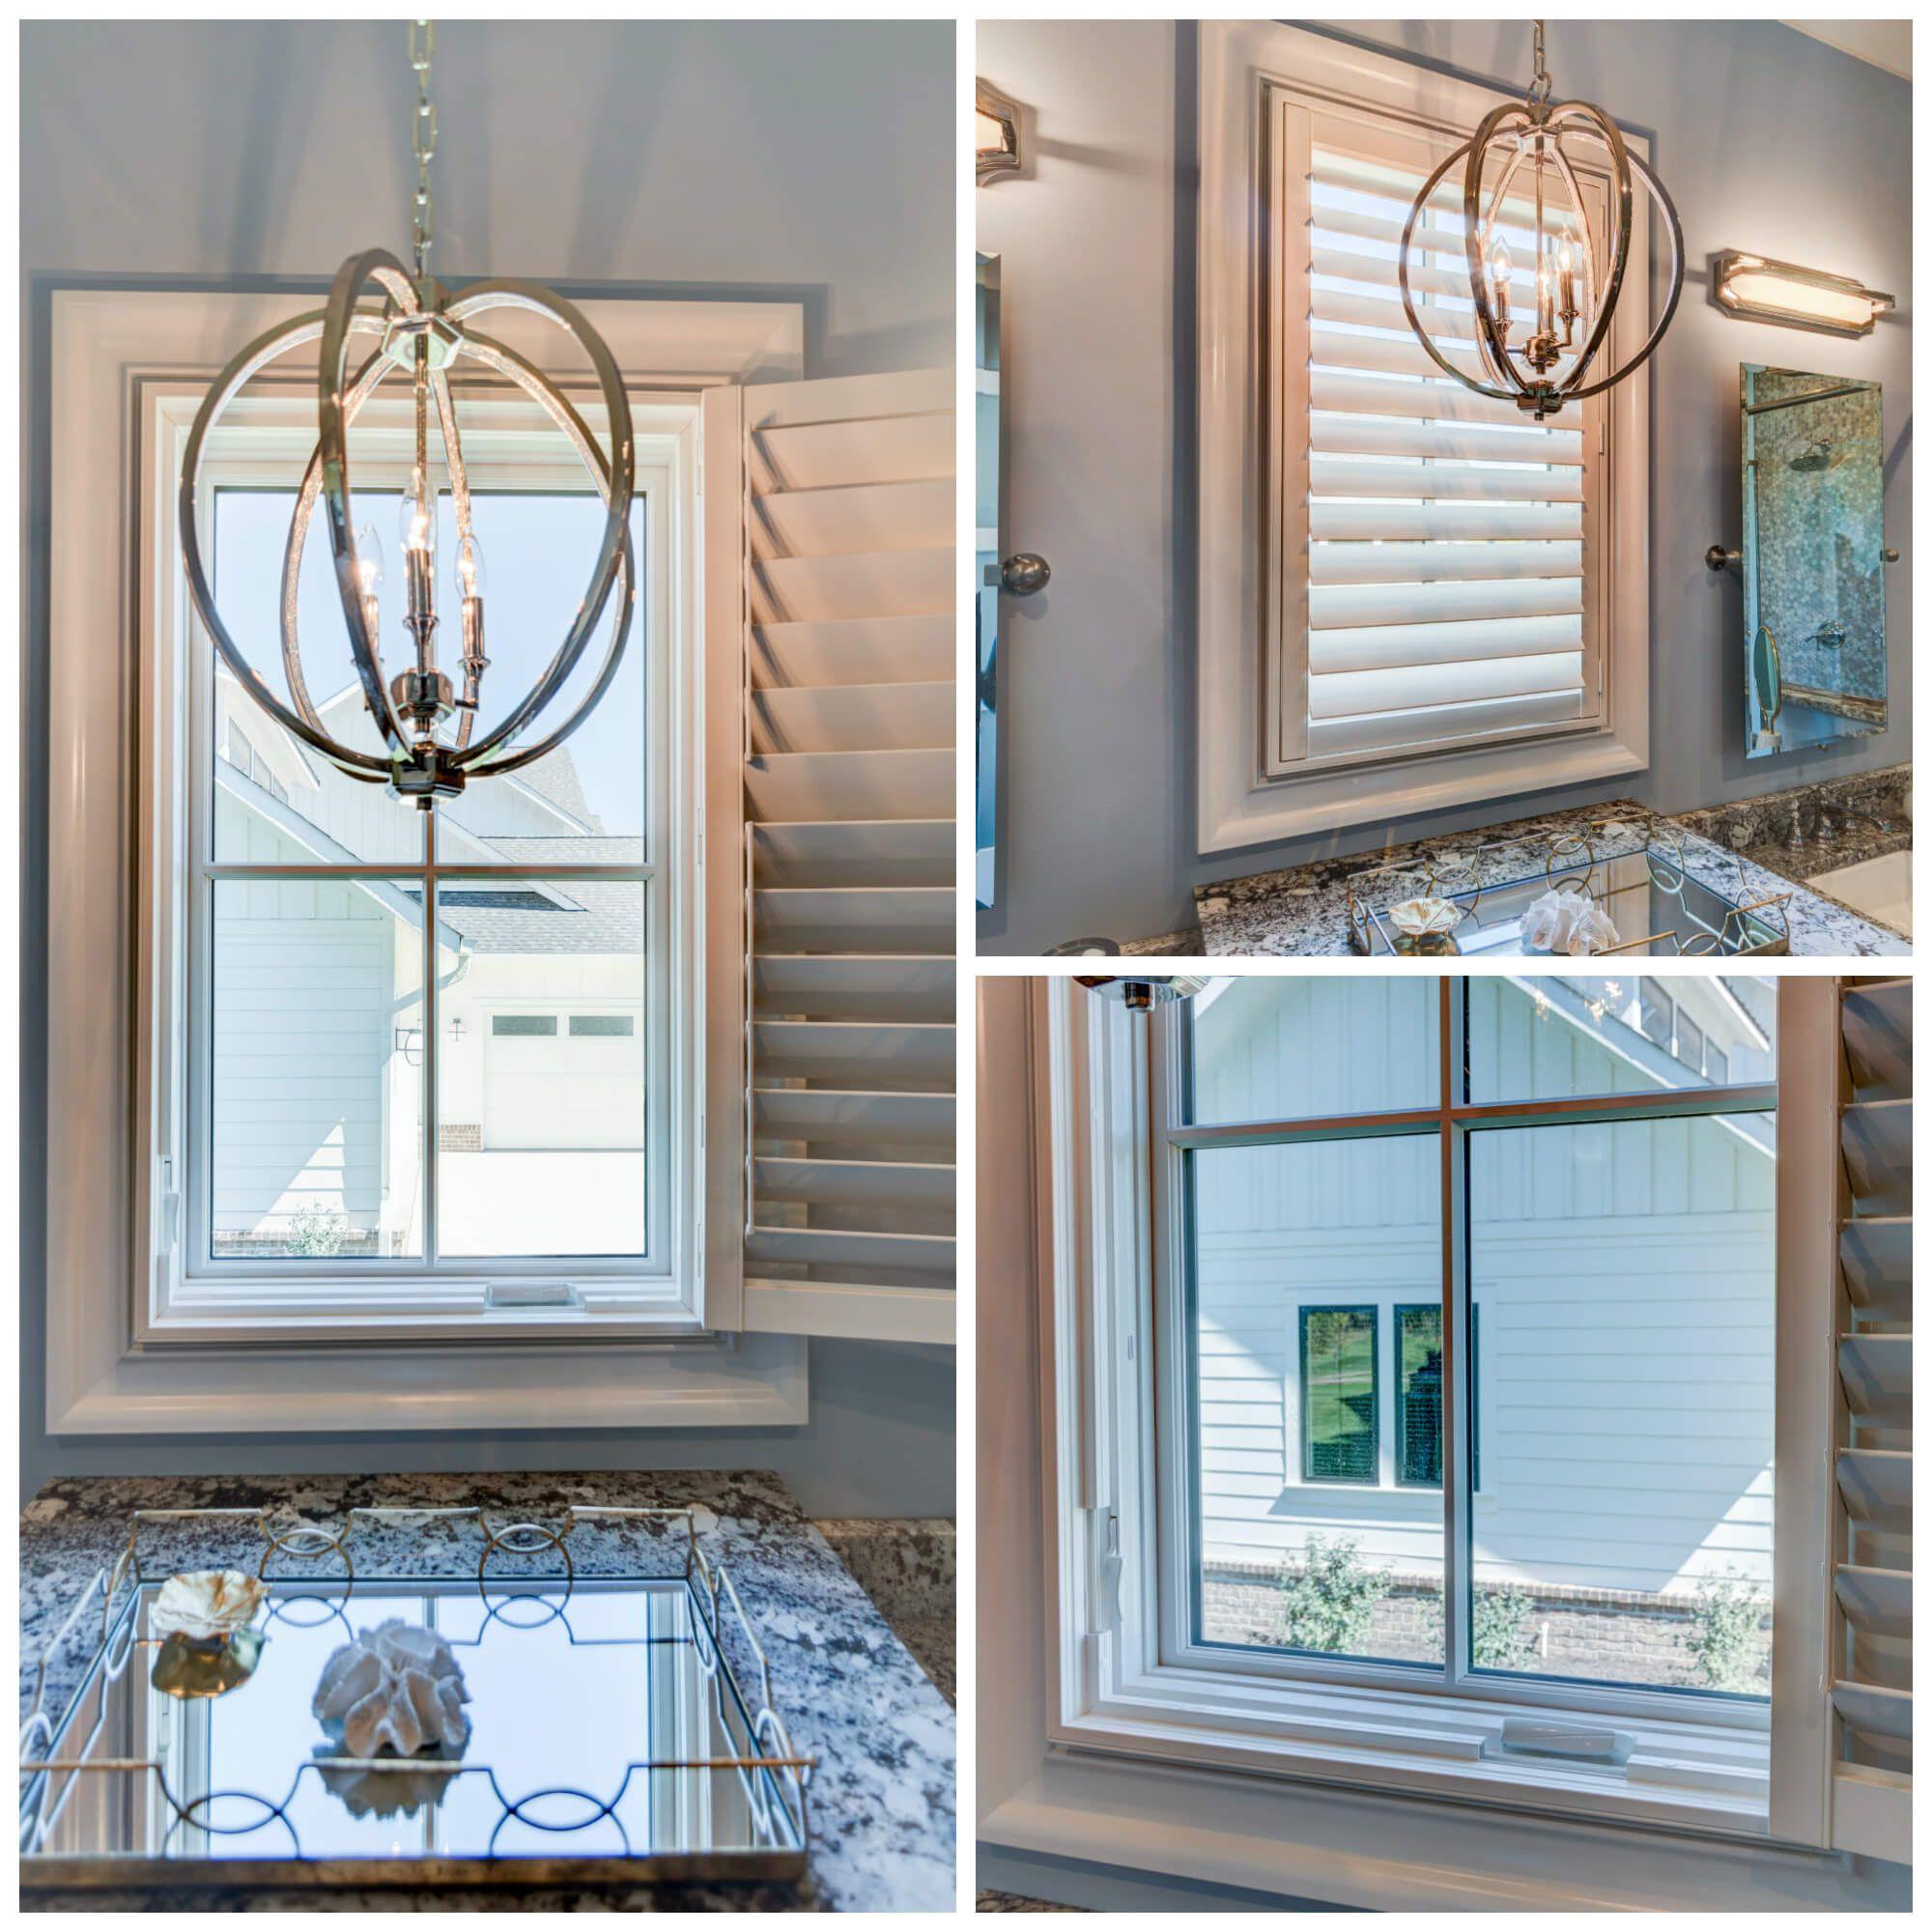 Window Treatments That Don't Hide Trim   Drapery Street   Door ...